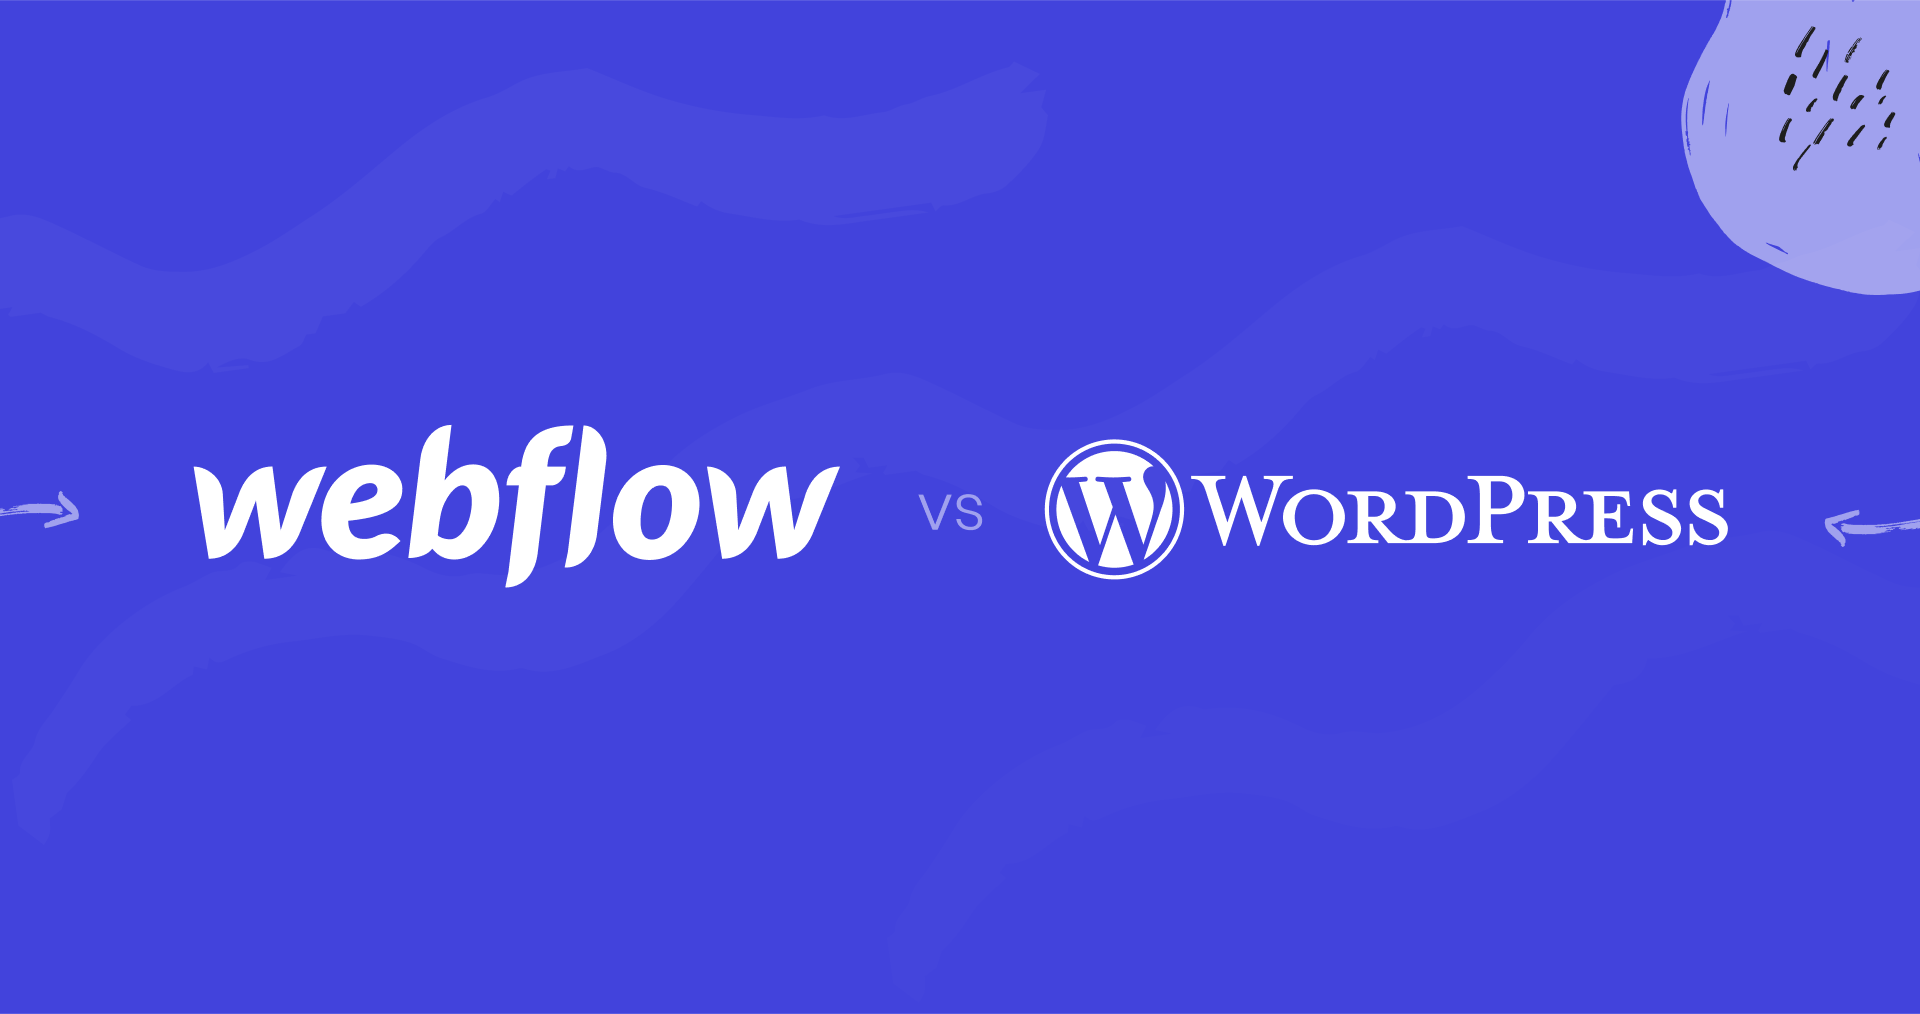 Webflow vs Wordpress Image